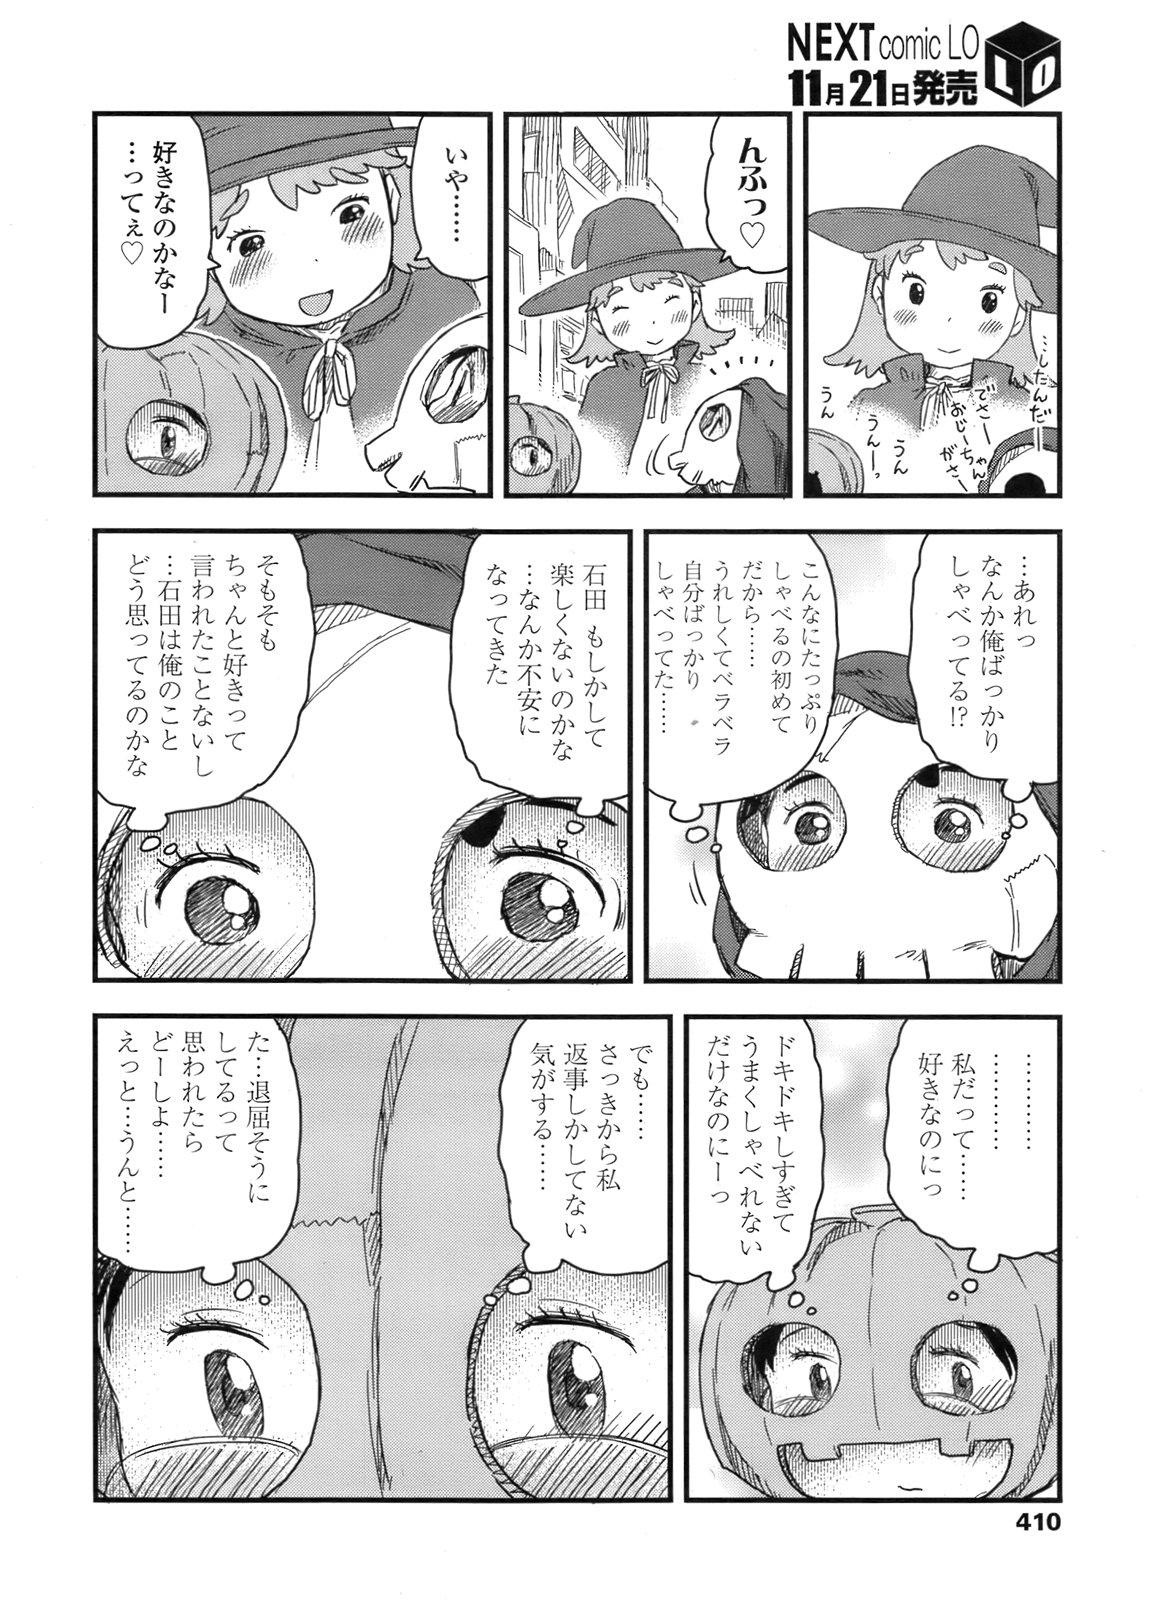 COMIC LO 2011-12 Vol. 93 410